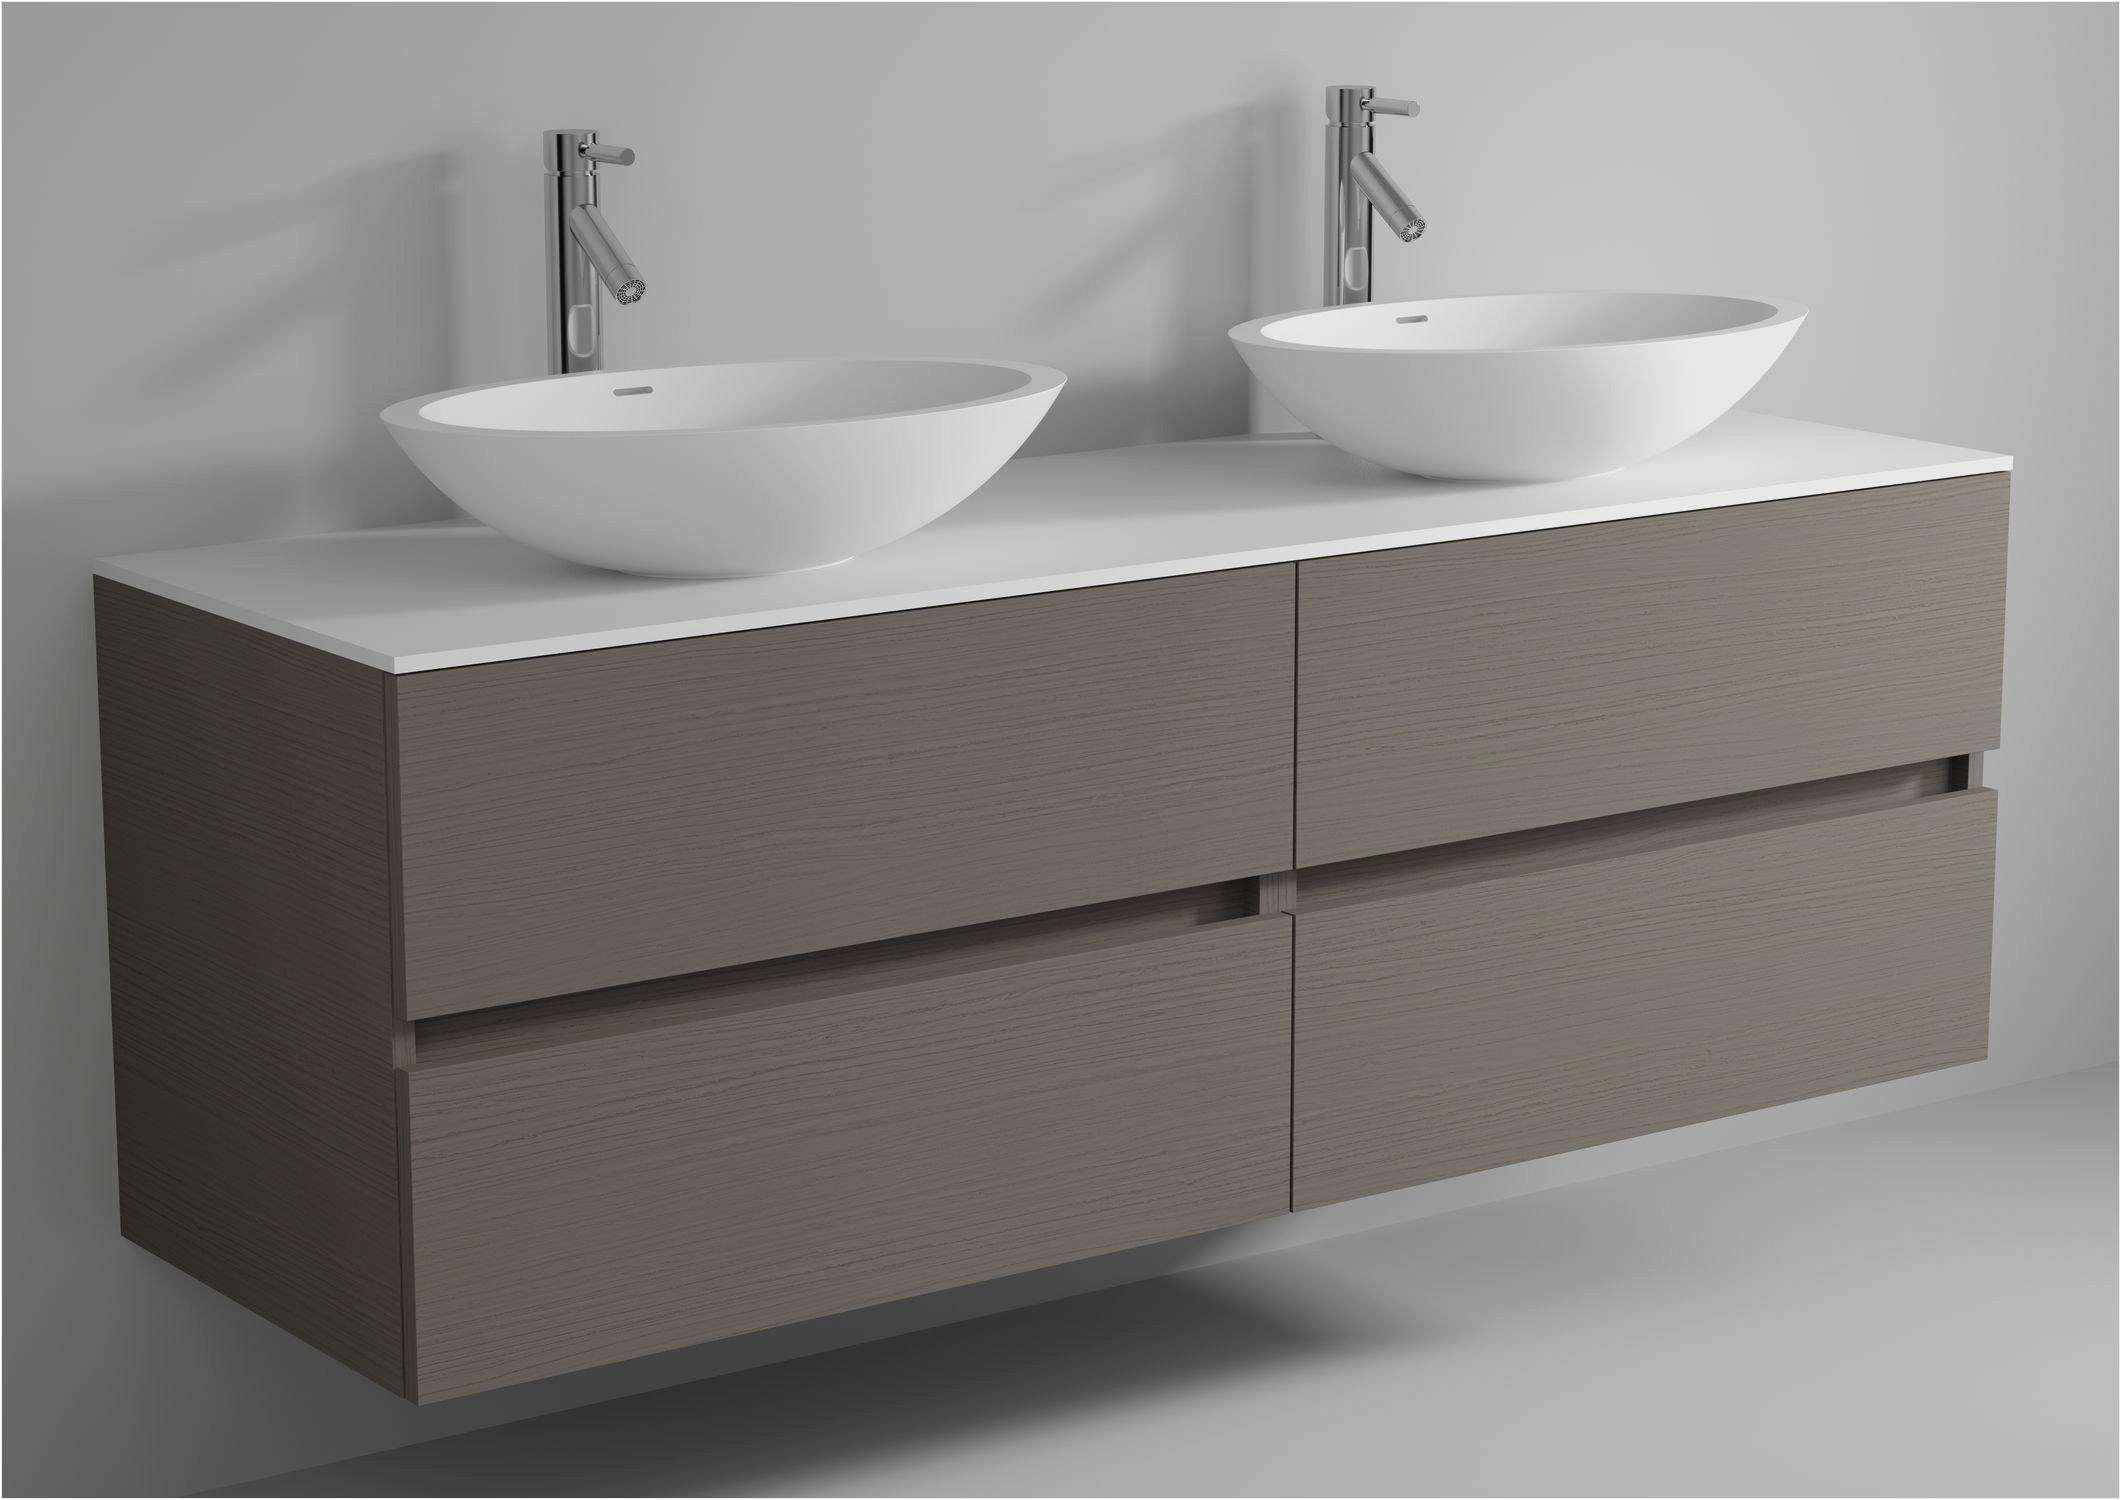 spiegel fur badezimmer neu badezimmerschrank spiegel holz of spiegel fur badezimmer